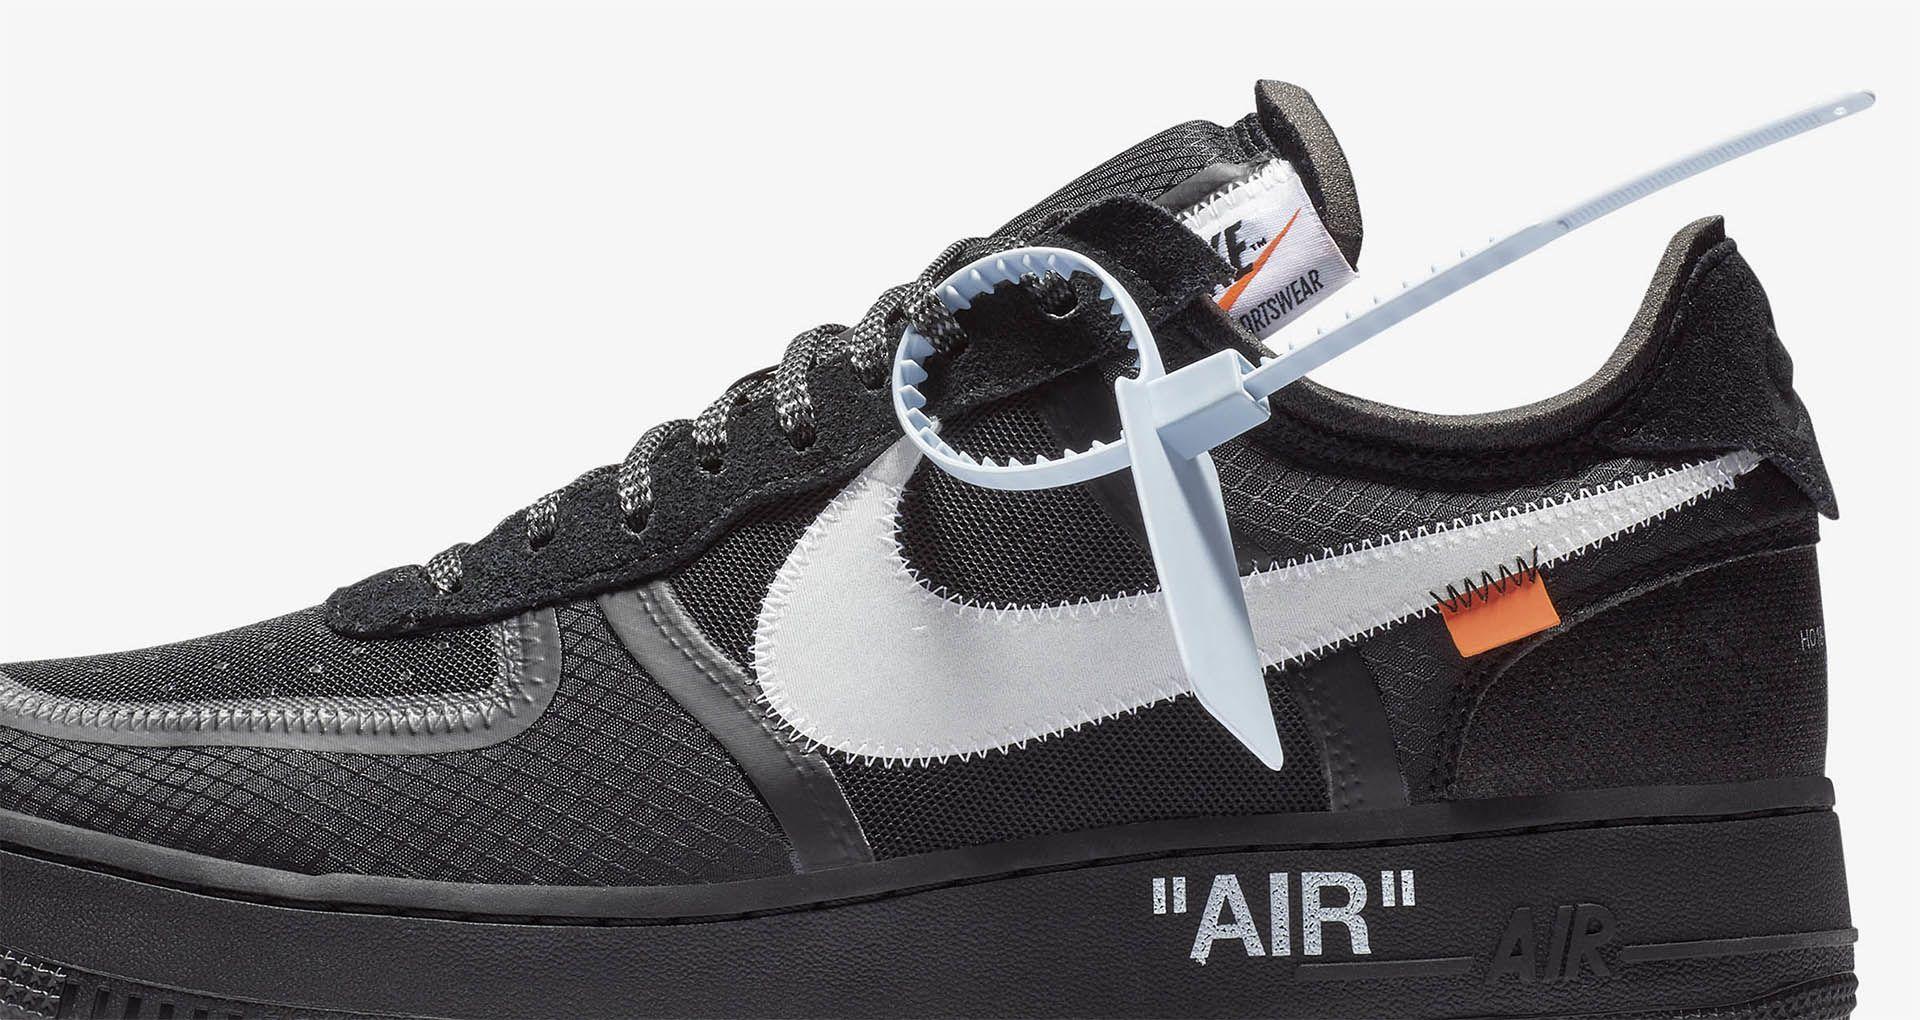 09-nike-air-force-1-off-white-black-white-ao4606-001